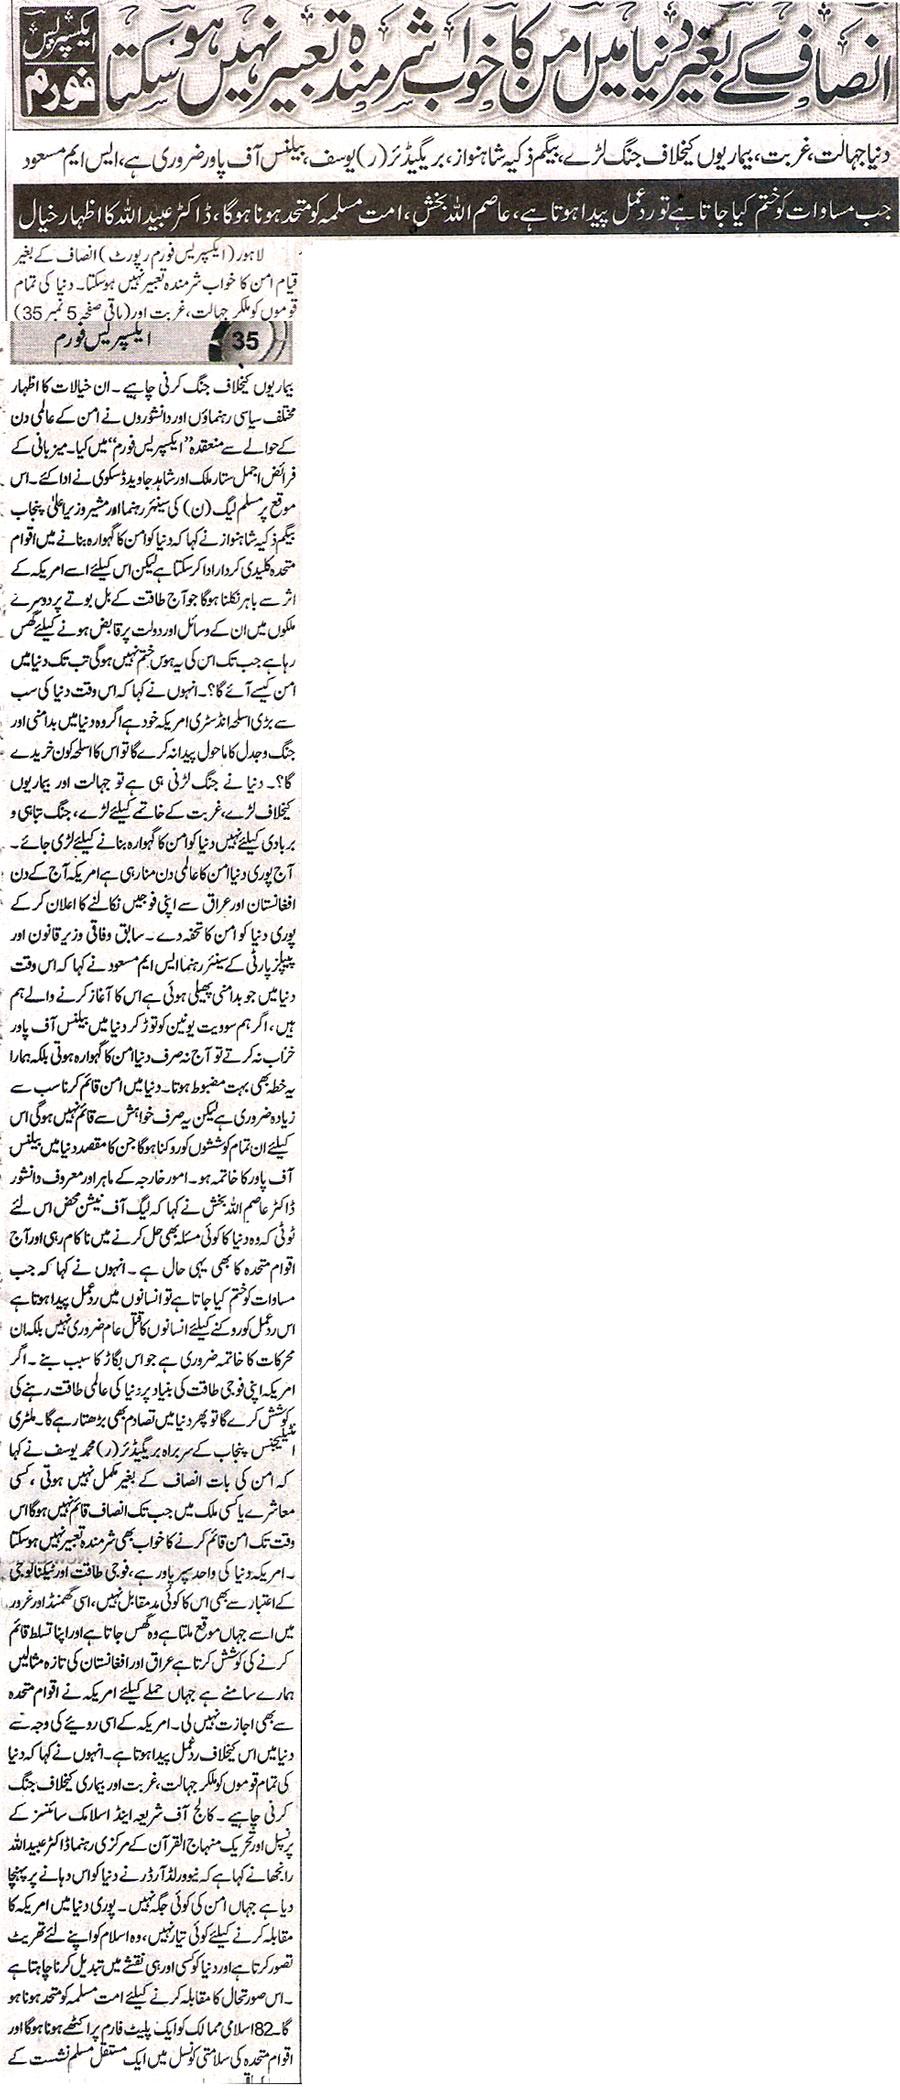 تحریک منہاج القرآن Minhaj-ul-Quran  Print Media Coverage پرنٹ میڈیا کوریج Daily Express. Back Page